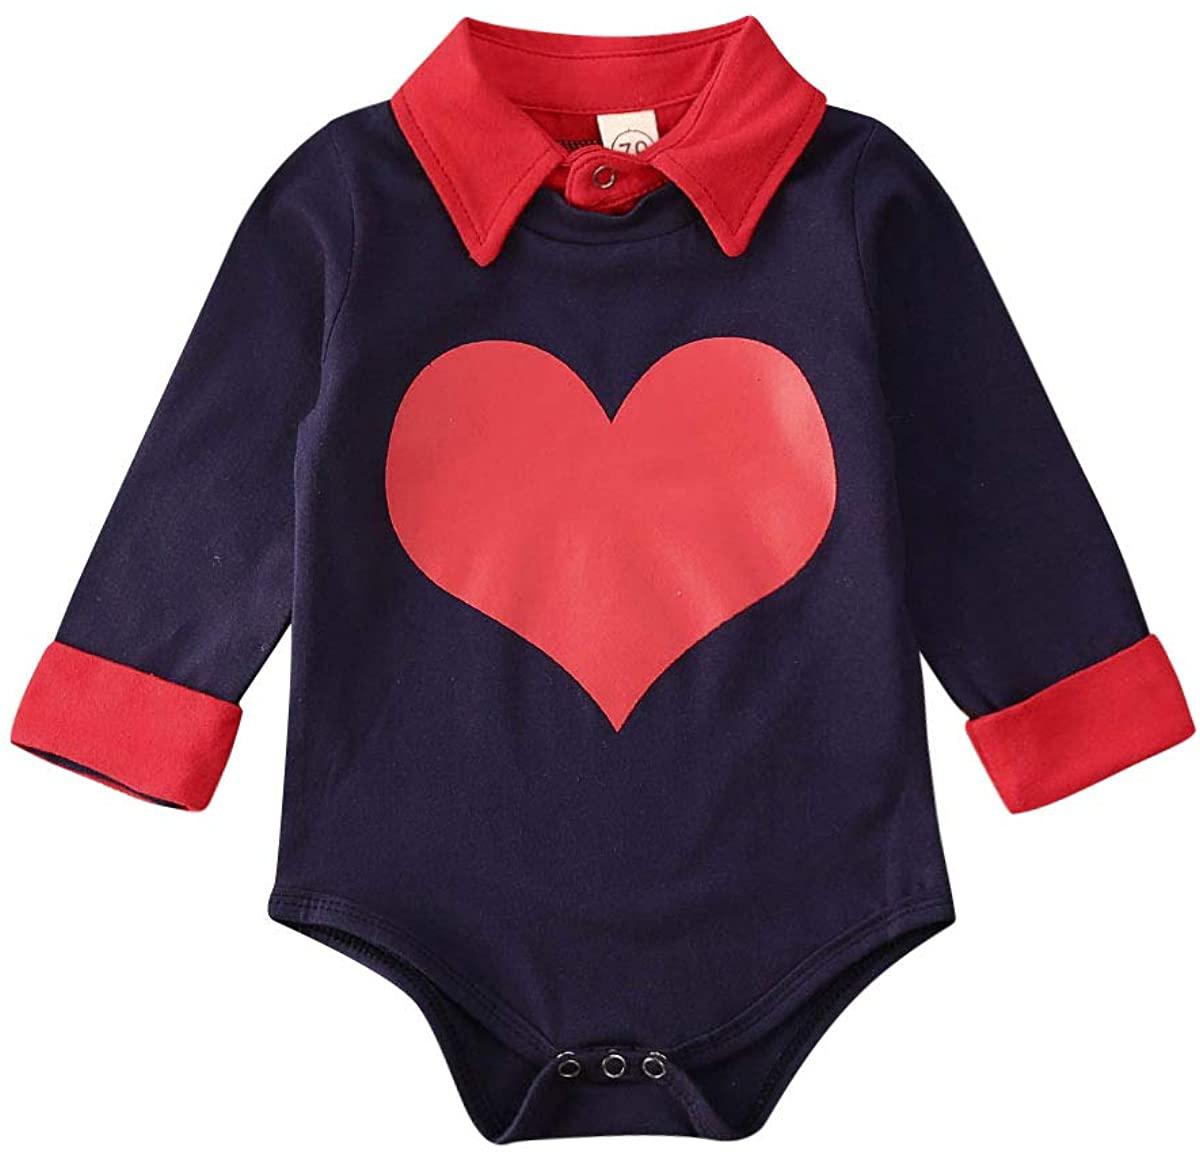 Infant Baby Boys Valentines Day Cotton Bodysuit Romper Gentleman Baby Boy Jumpsuit Tops